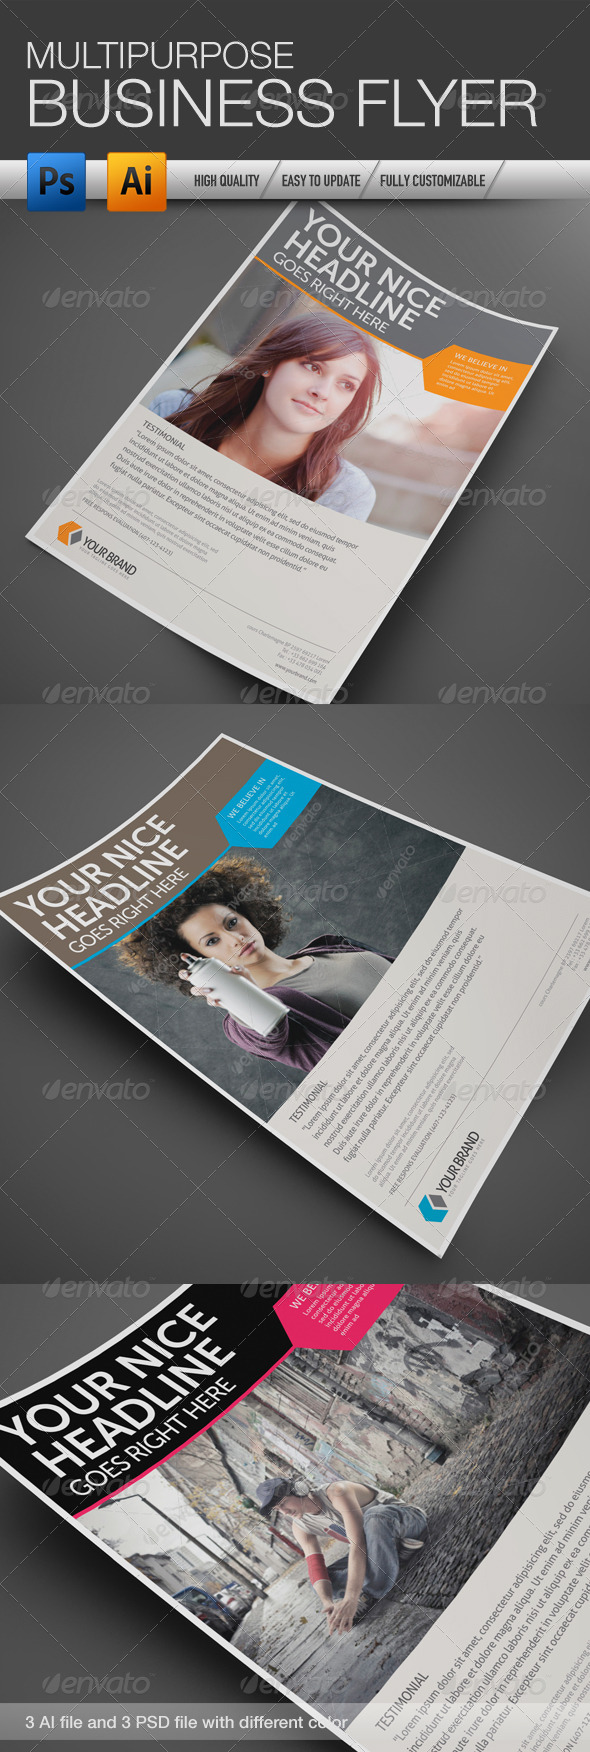 GraphicRiver Multipurpose Business Flyer 4 4357970